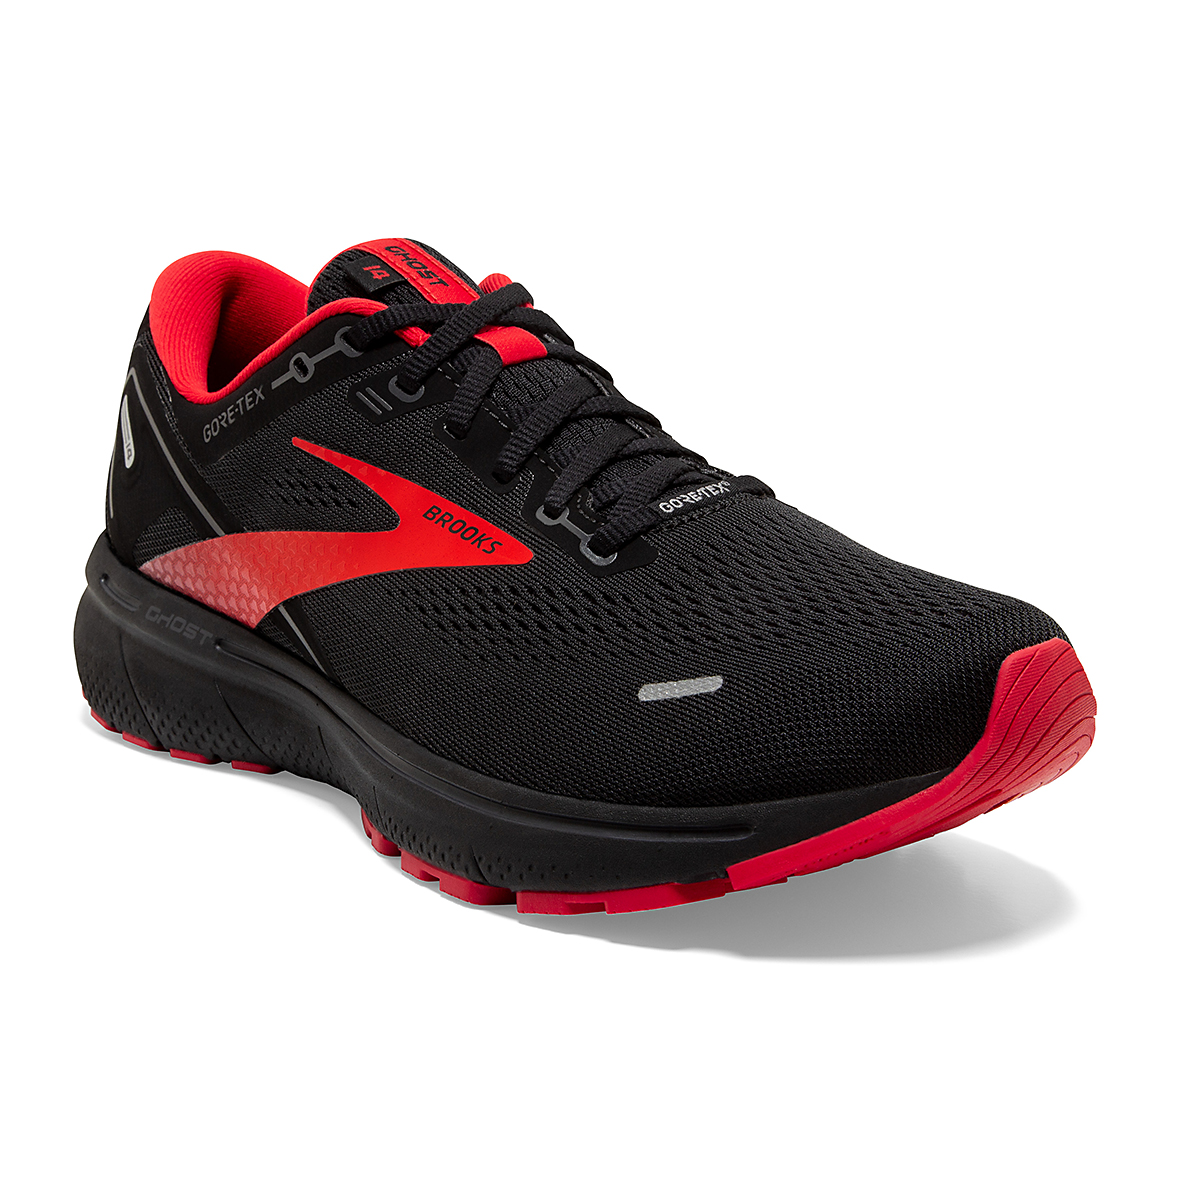 Men's Brooks Ghost 14 Gore-Tex Running Shoe - Color: Black/Blackened - Size: 7 - Width: Regular, Black/Blackened, large, image 5